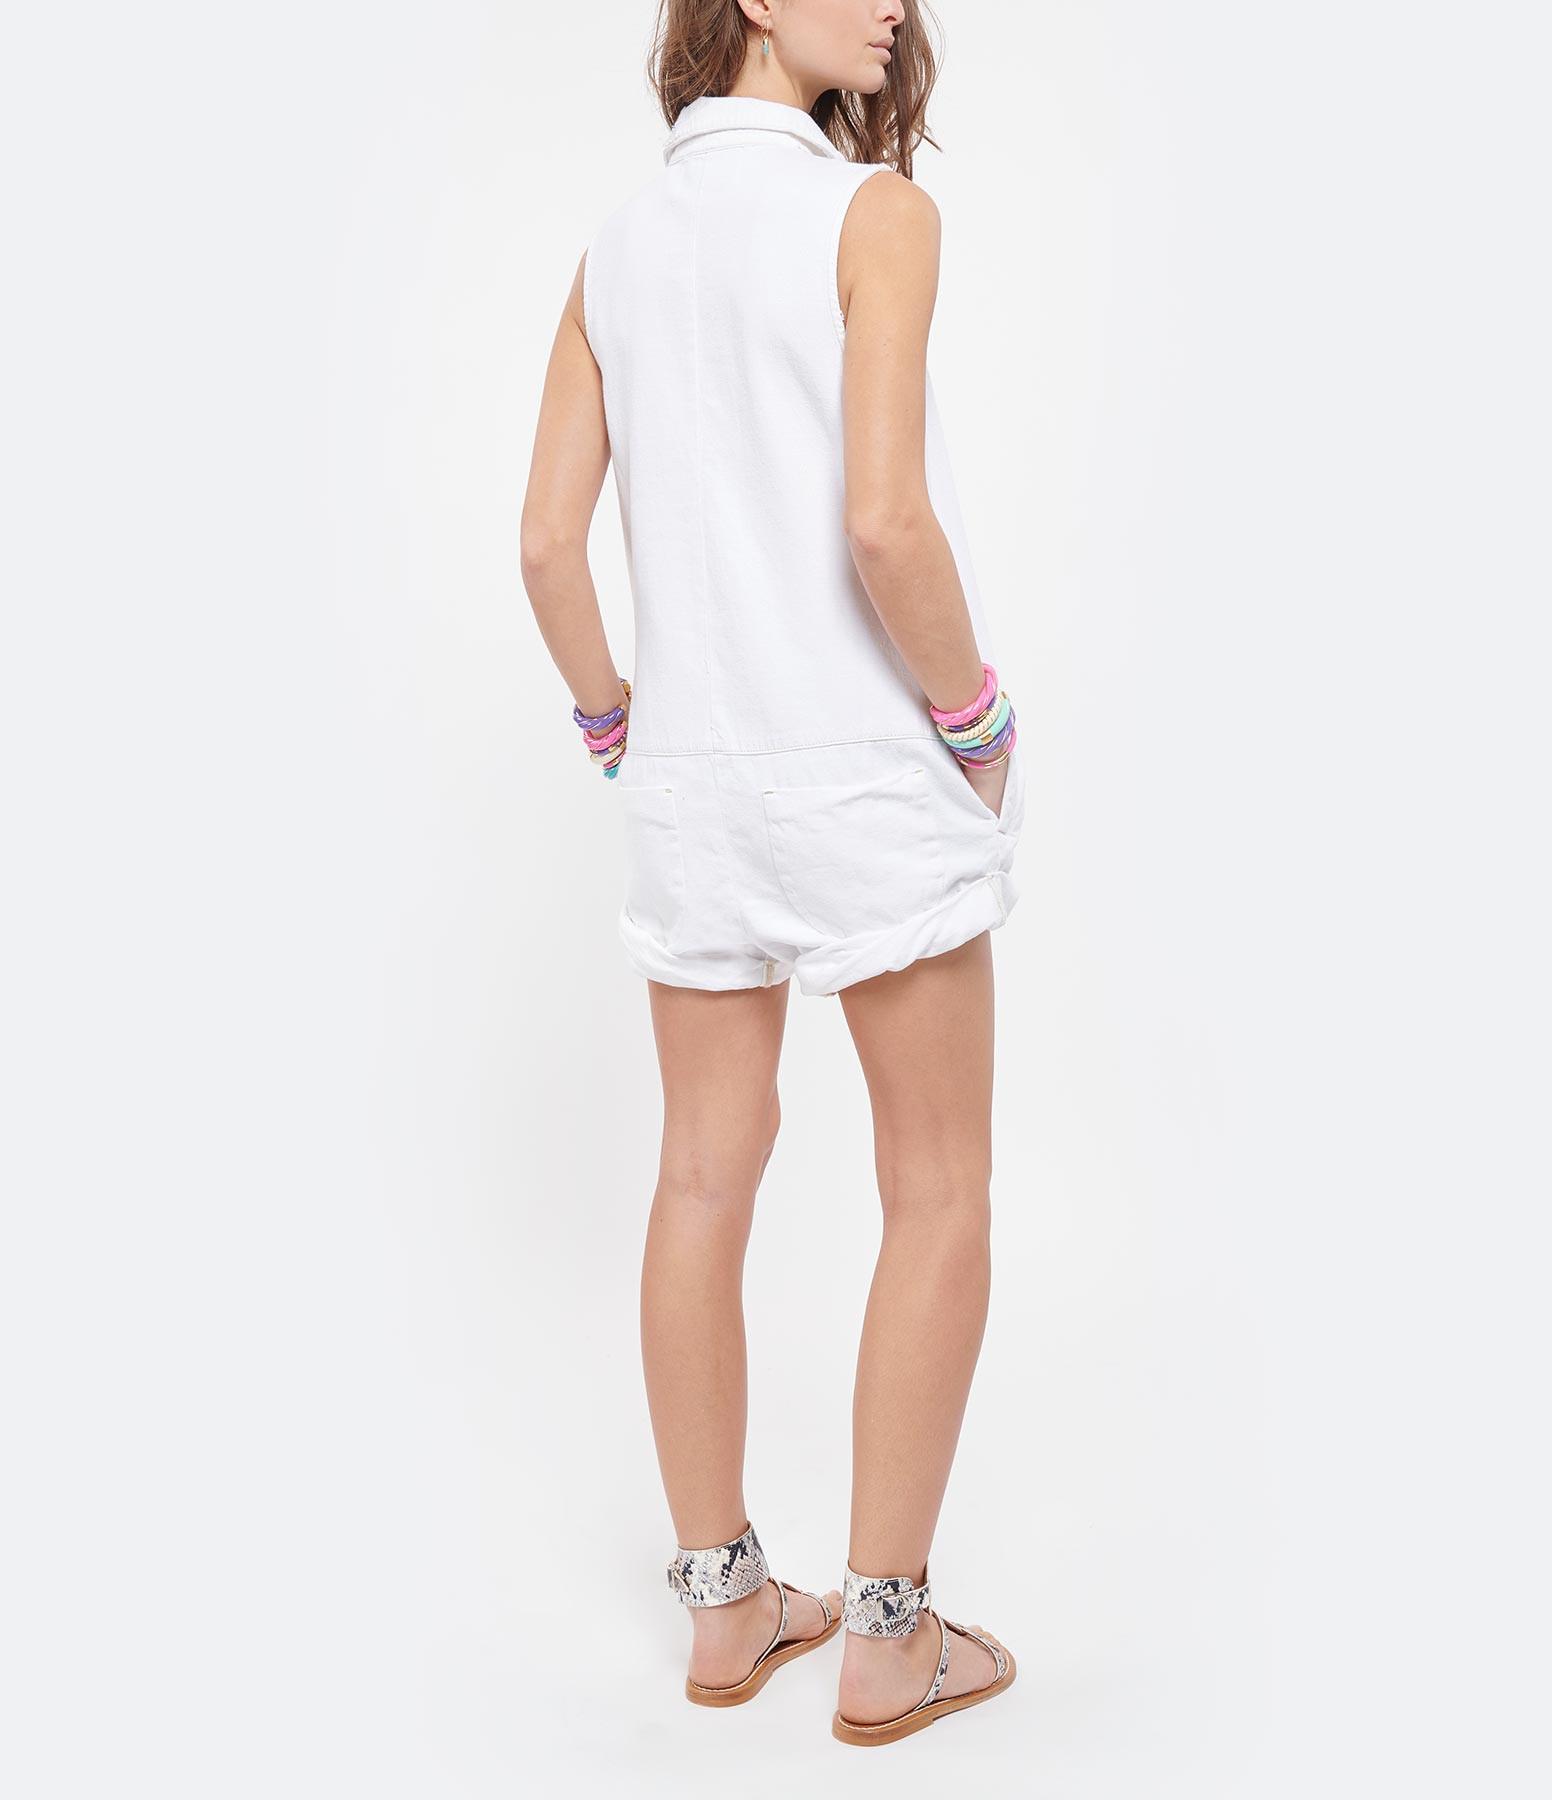 ONE TEASPOON - Combinaison Mini Braxton Blanc